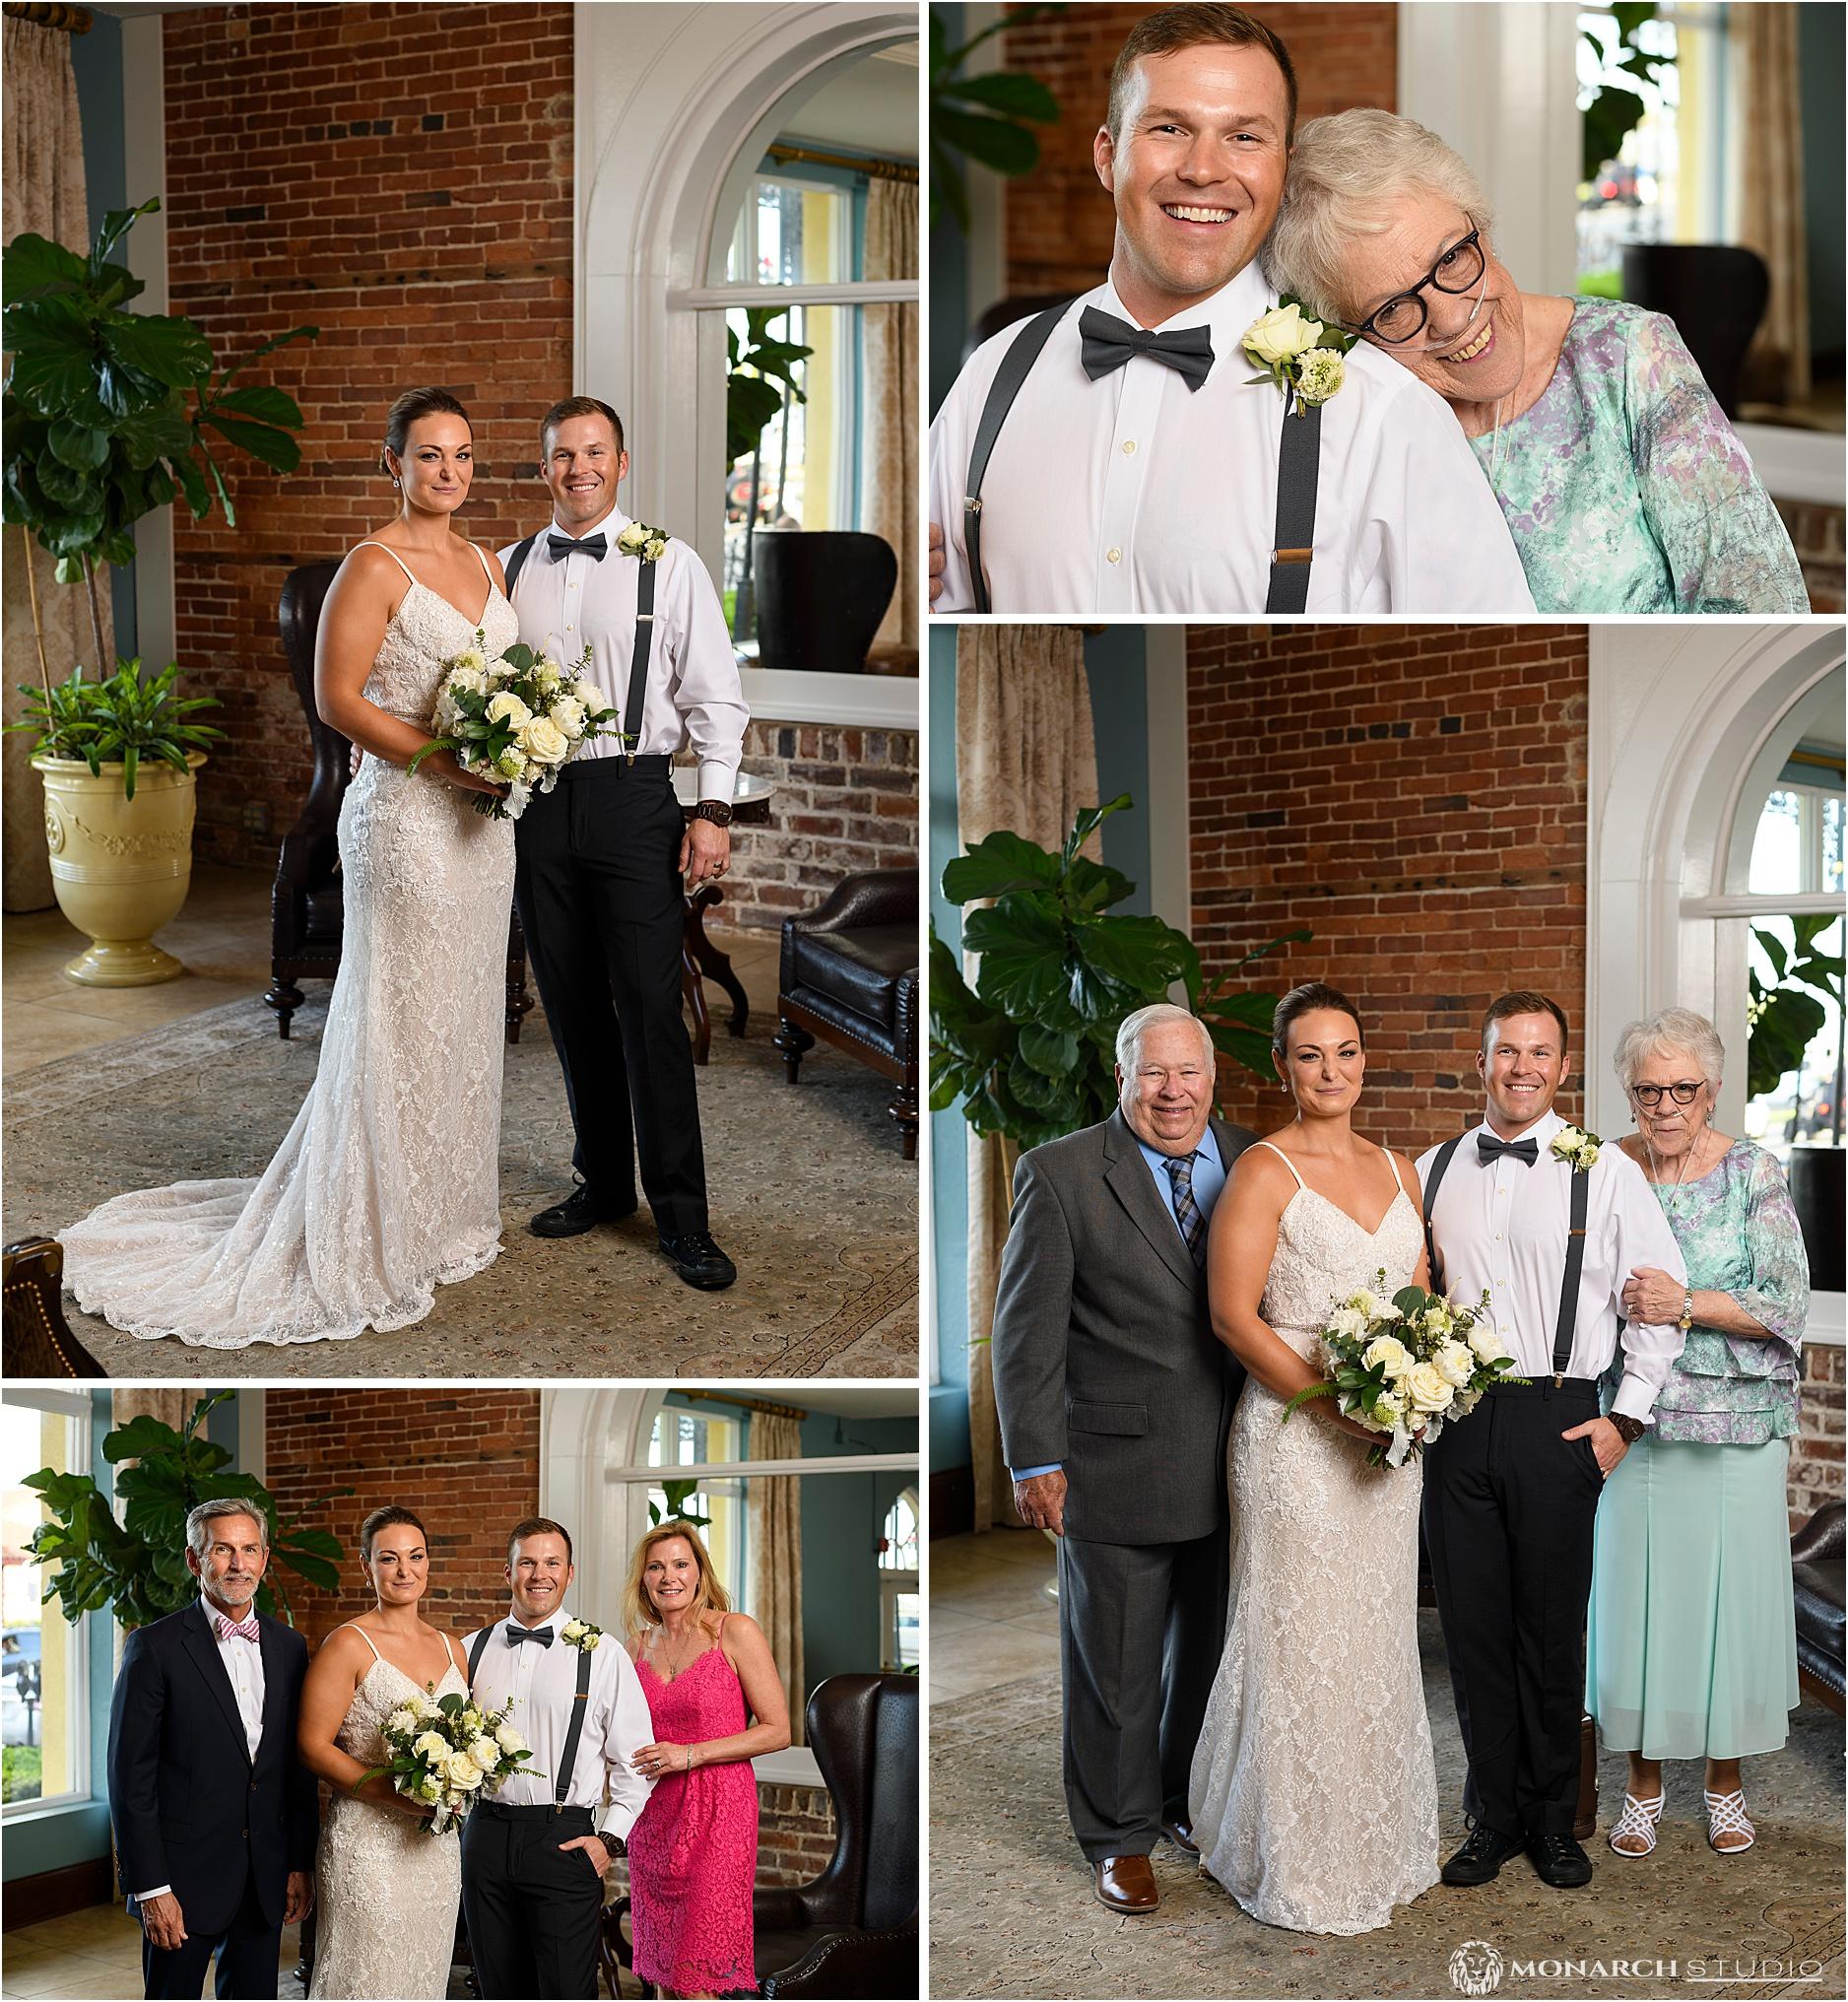 081-whiteroom-wedding-photographer-2019-05-22_0063.jpg